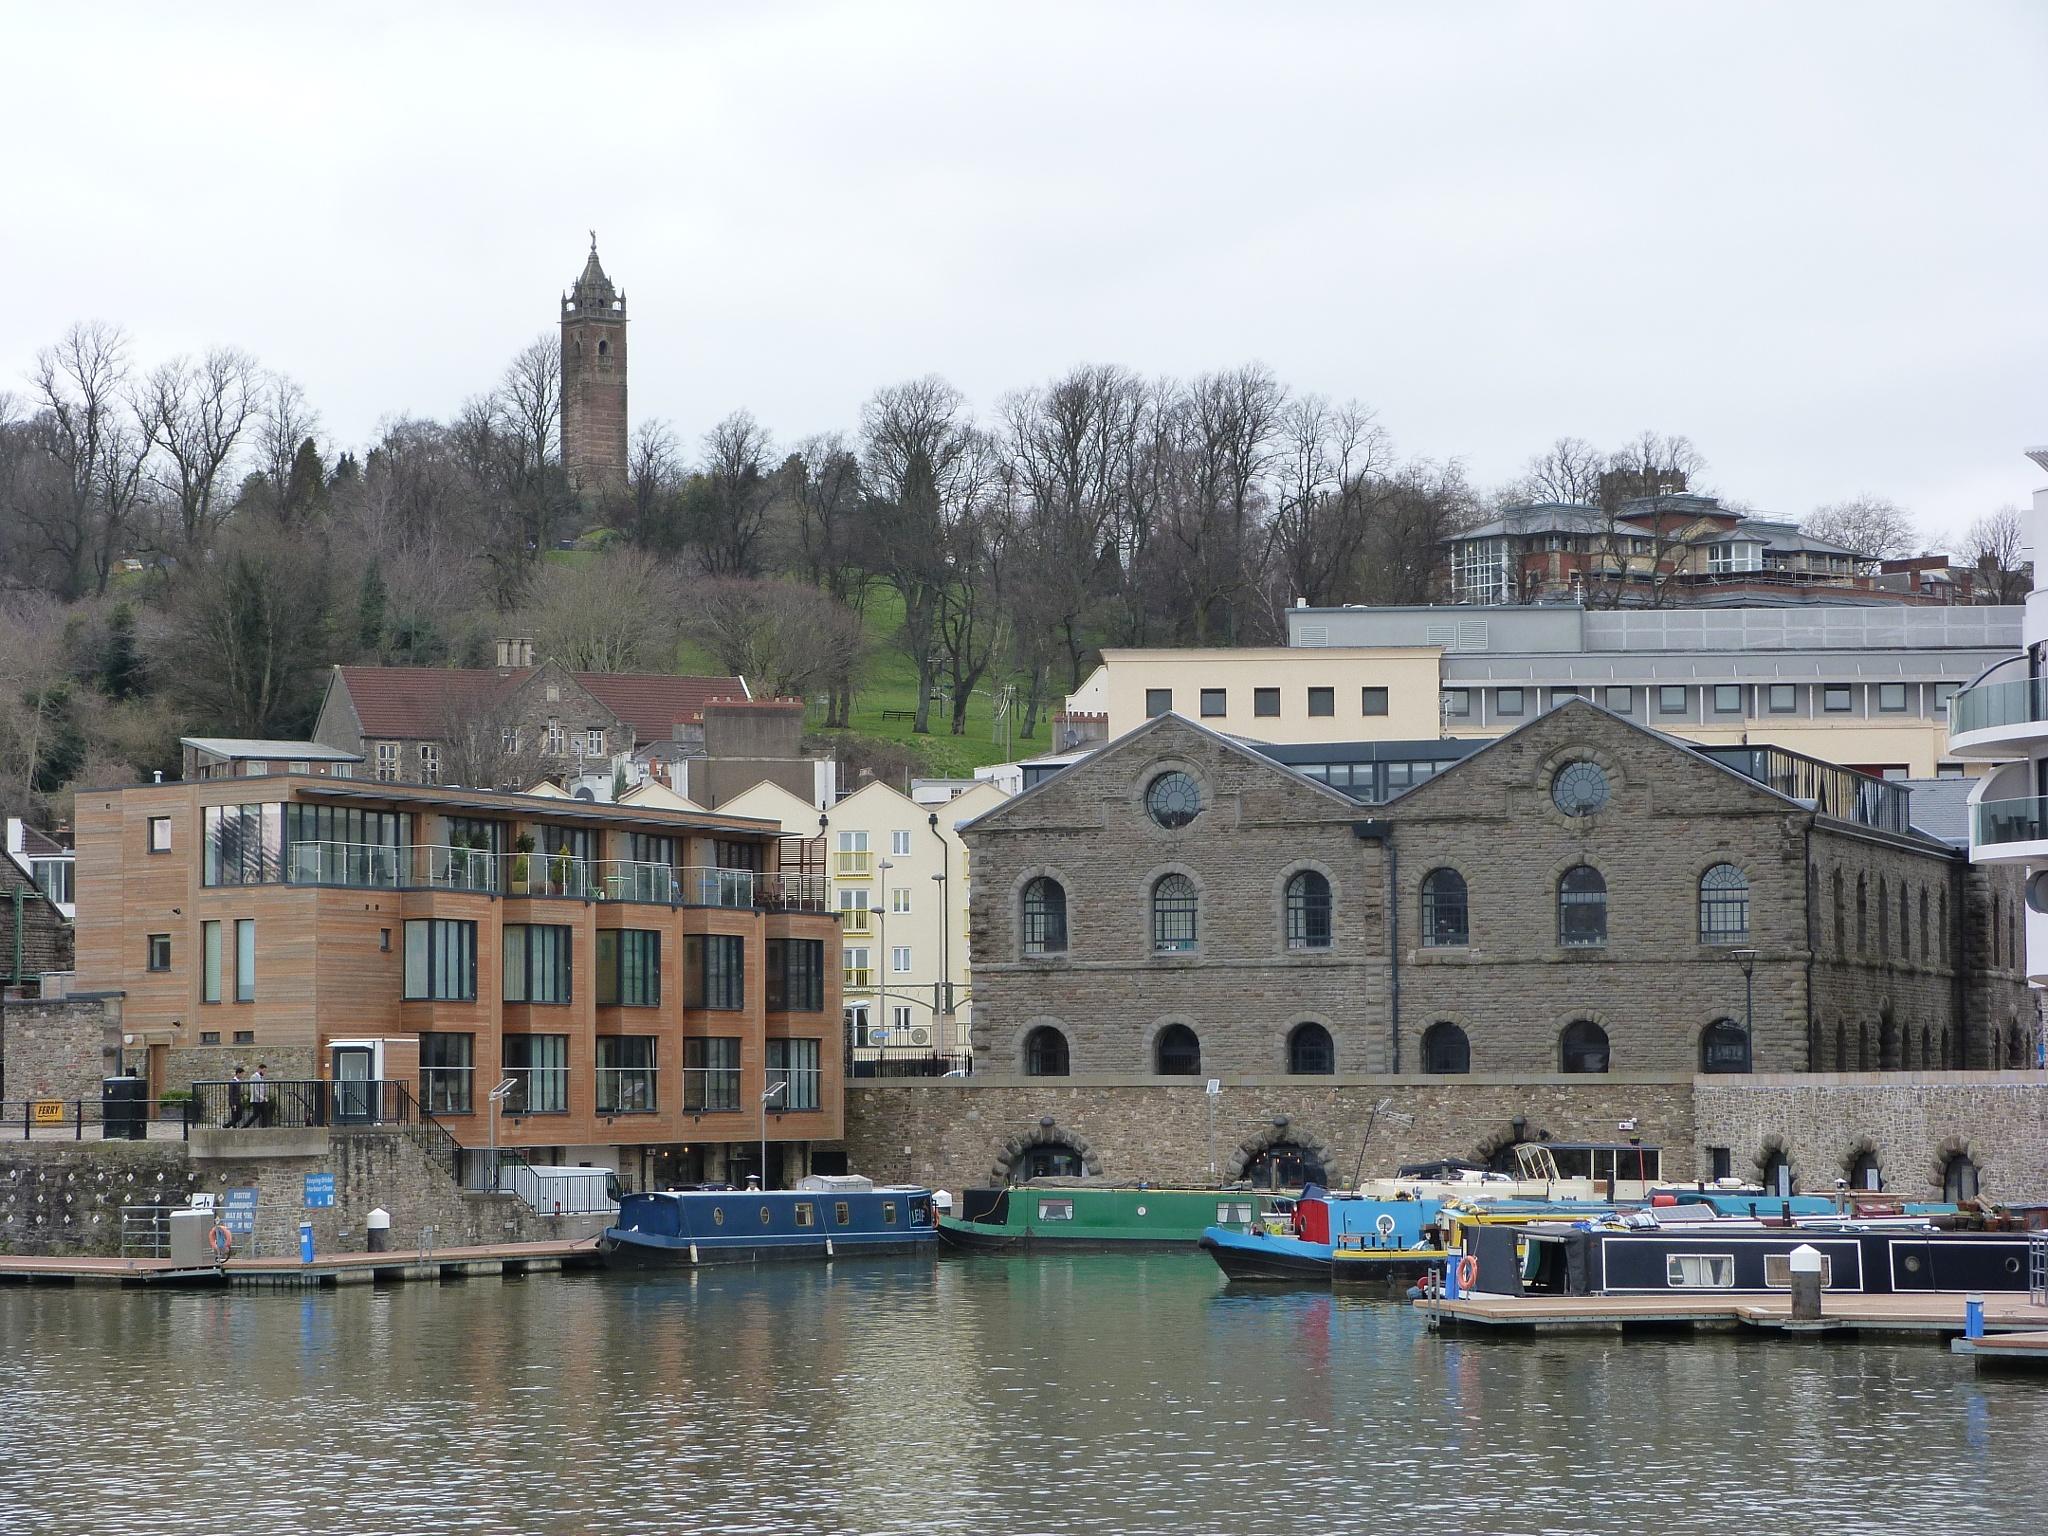 Bristol Docks by stevecocking